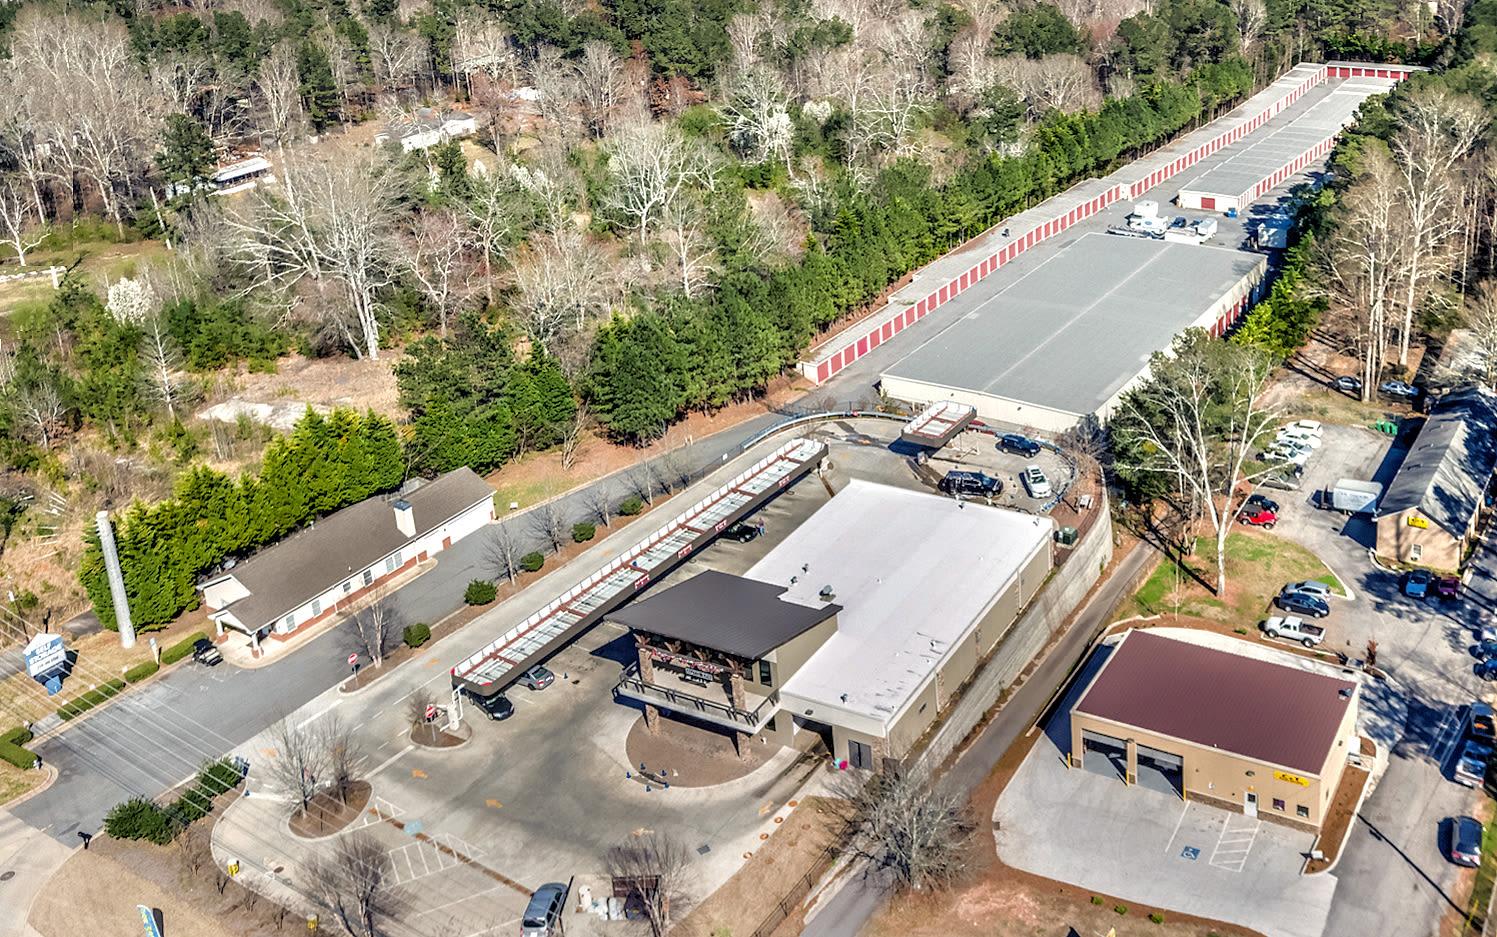 Aerial view of Prime Storage in Acworth, Georgia